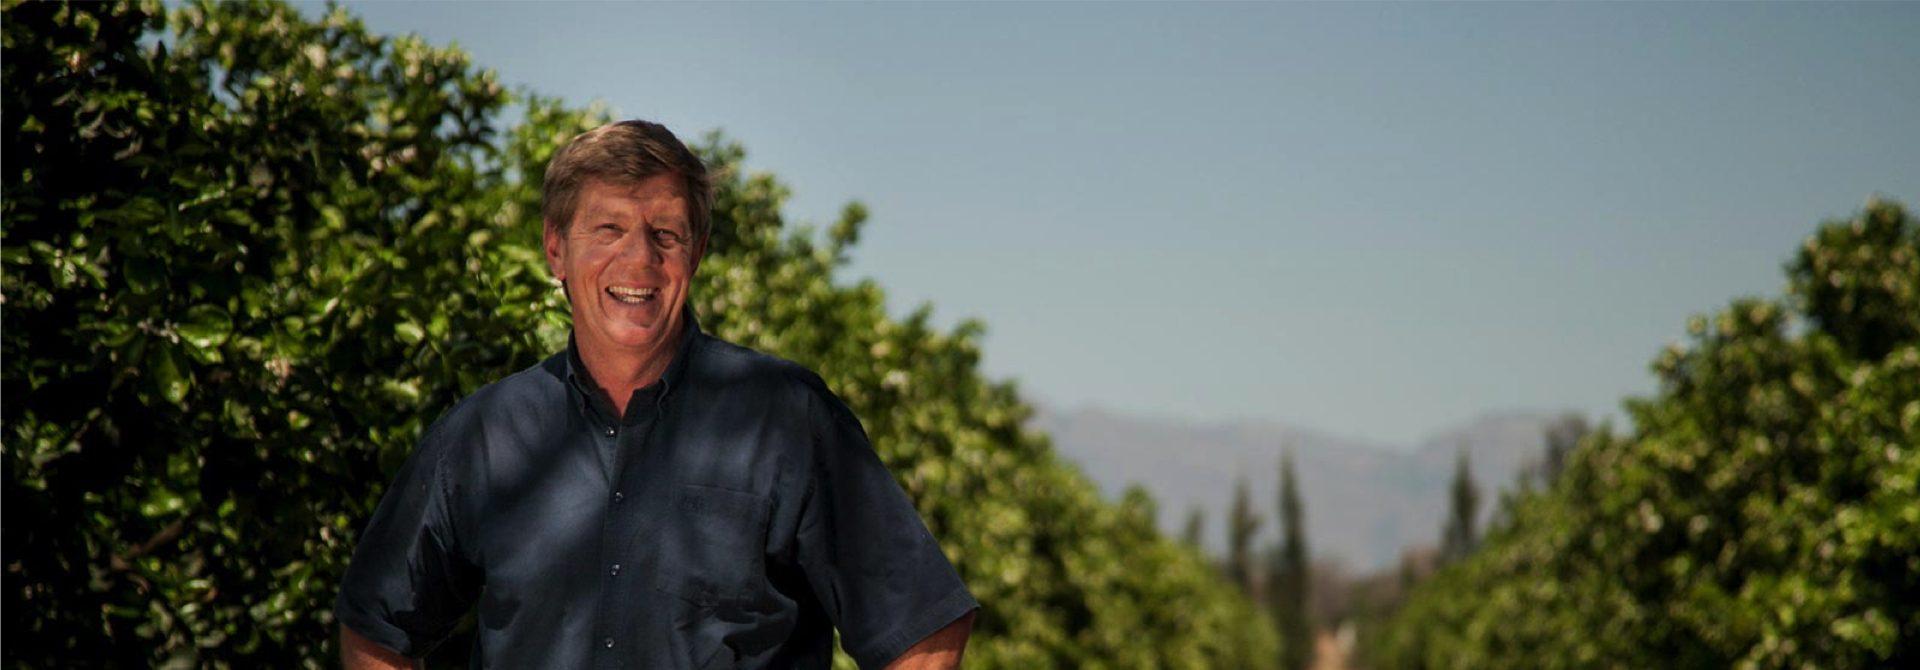 Pieter S CEO